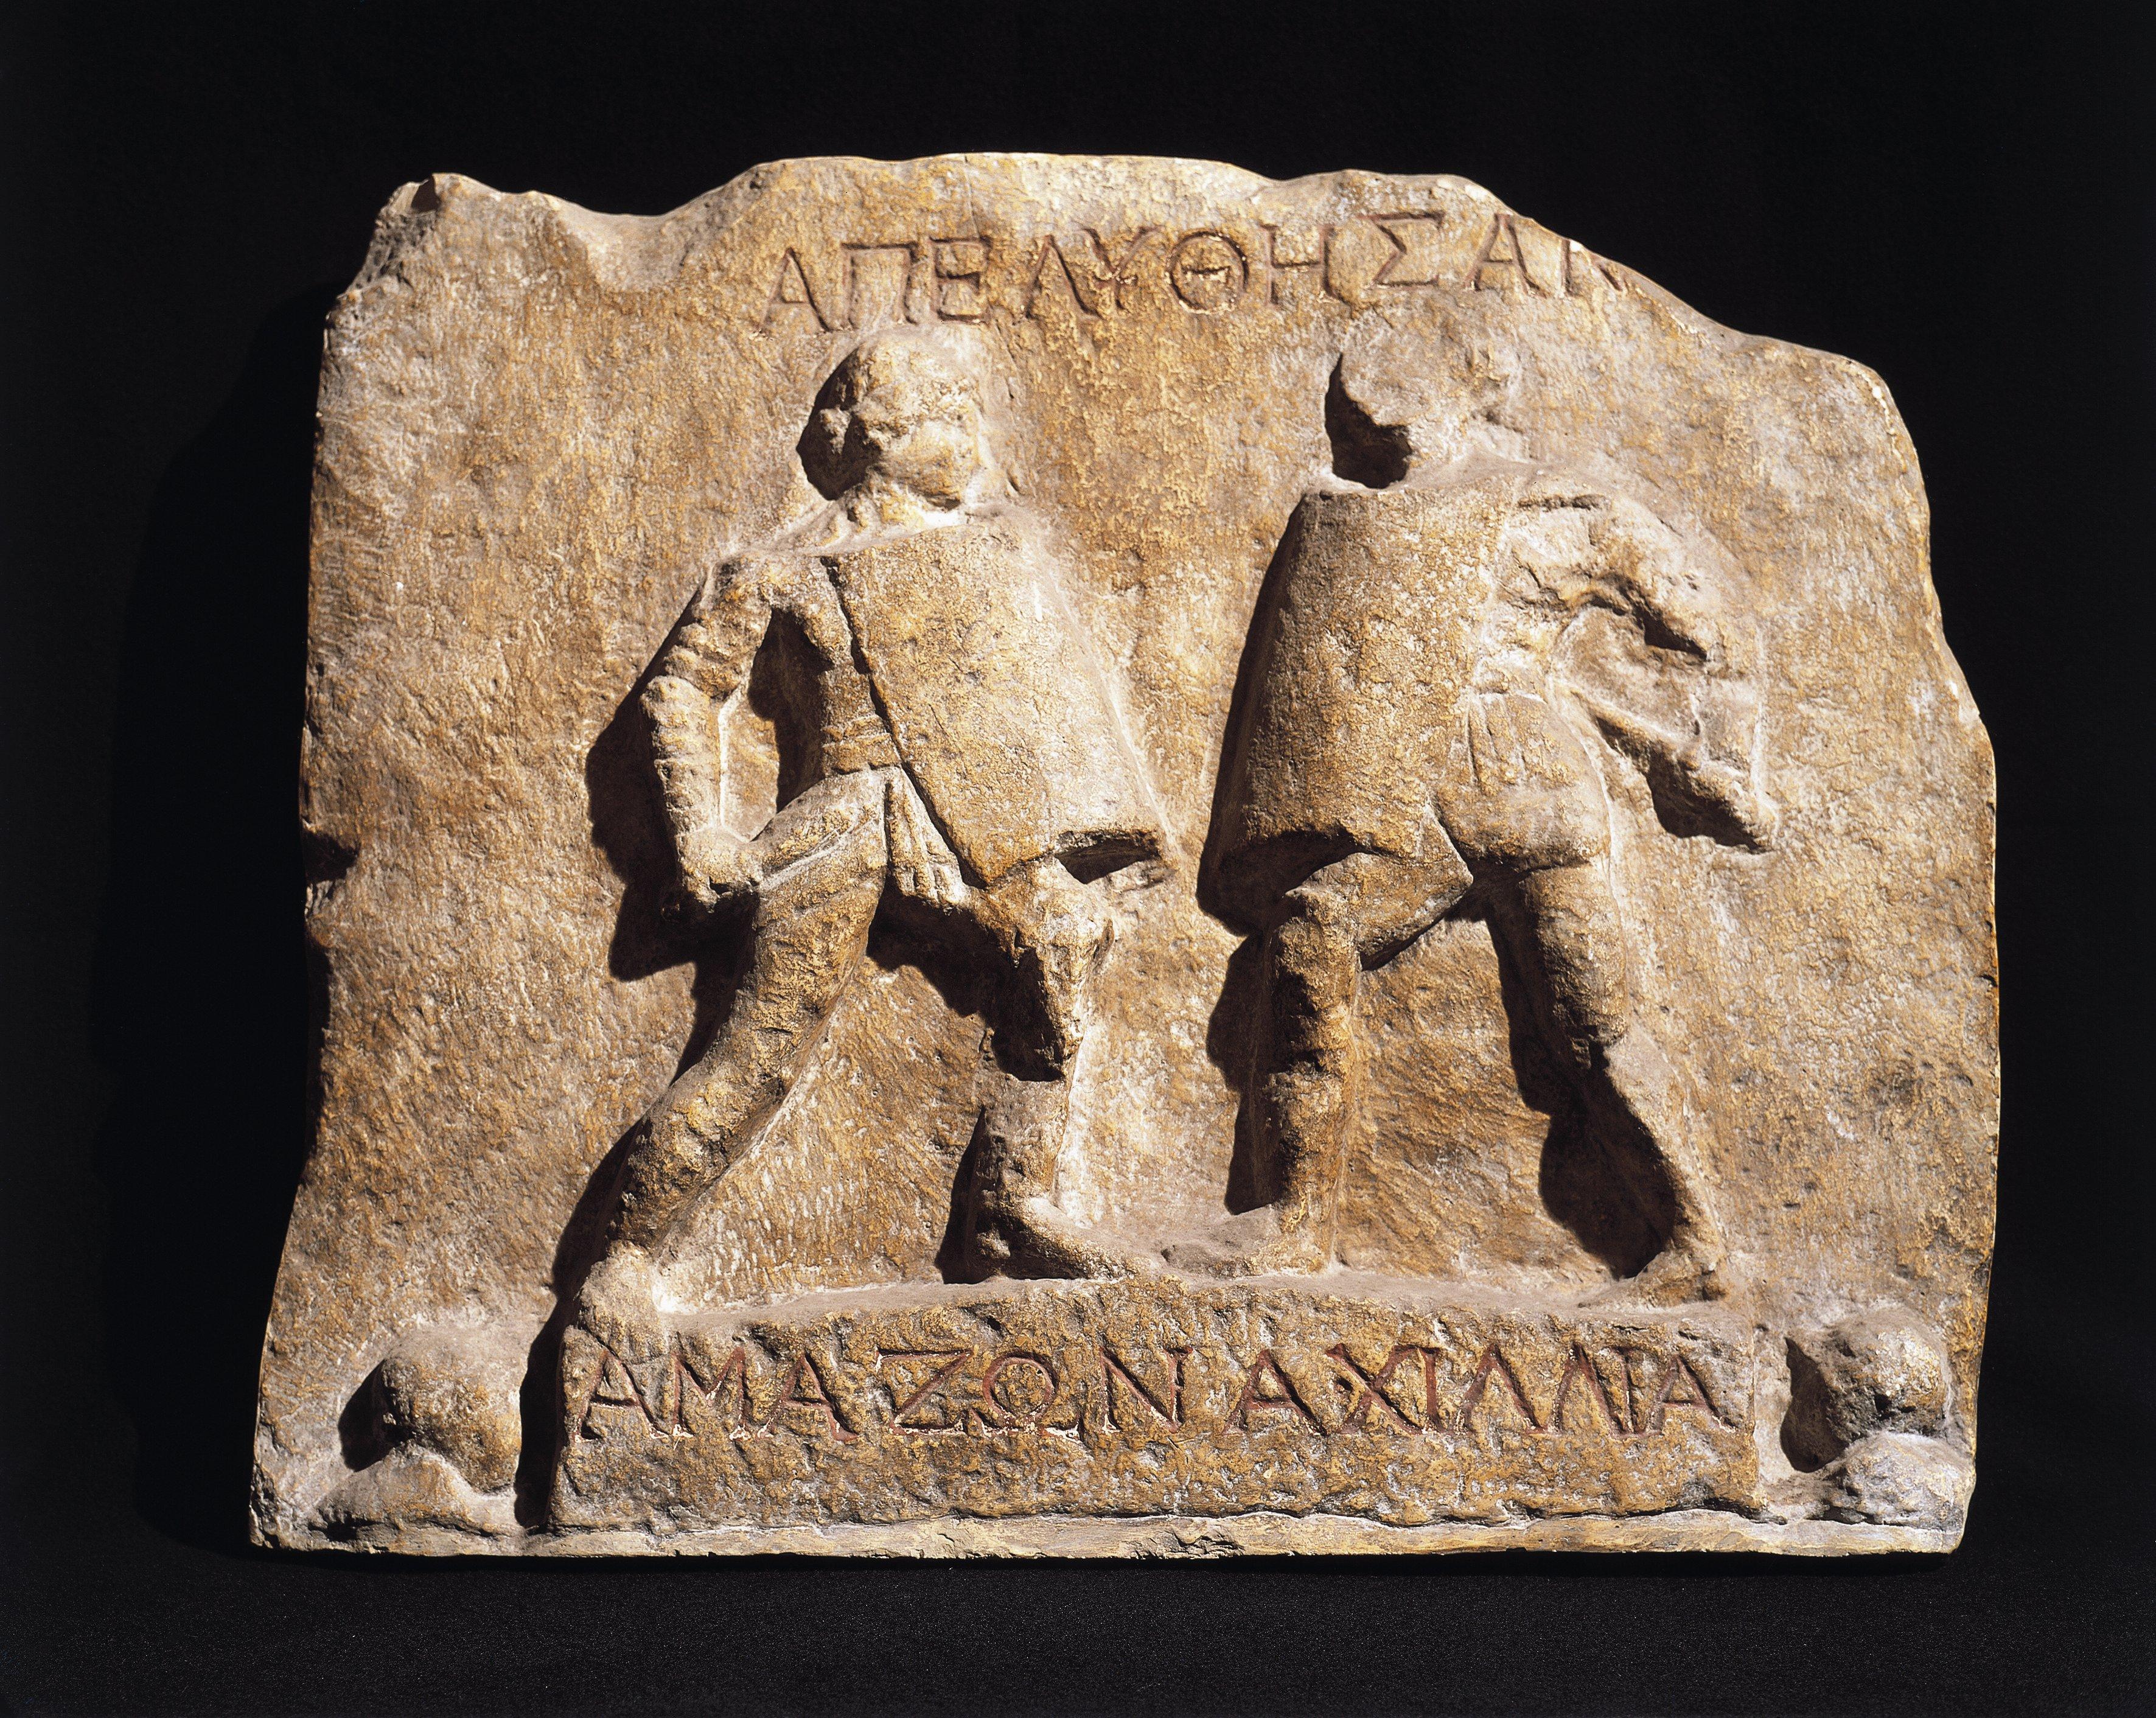 UNSPECIFIED - CIRCA 1900:  Roman civilization Relief portraying a fight between female gladiators.  (Photo By DEA / A. DAGLI ORTI/De Agostini/Getty Images)